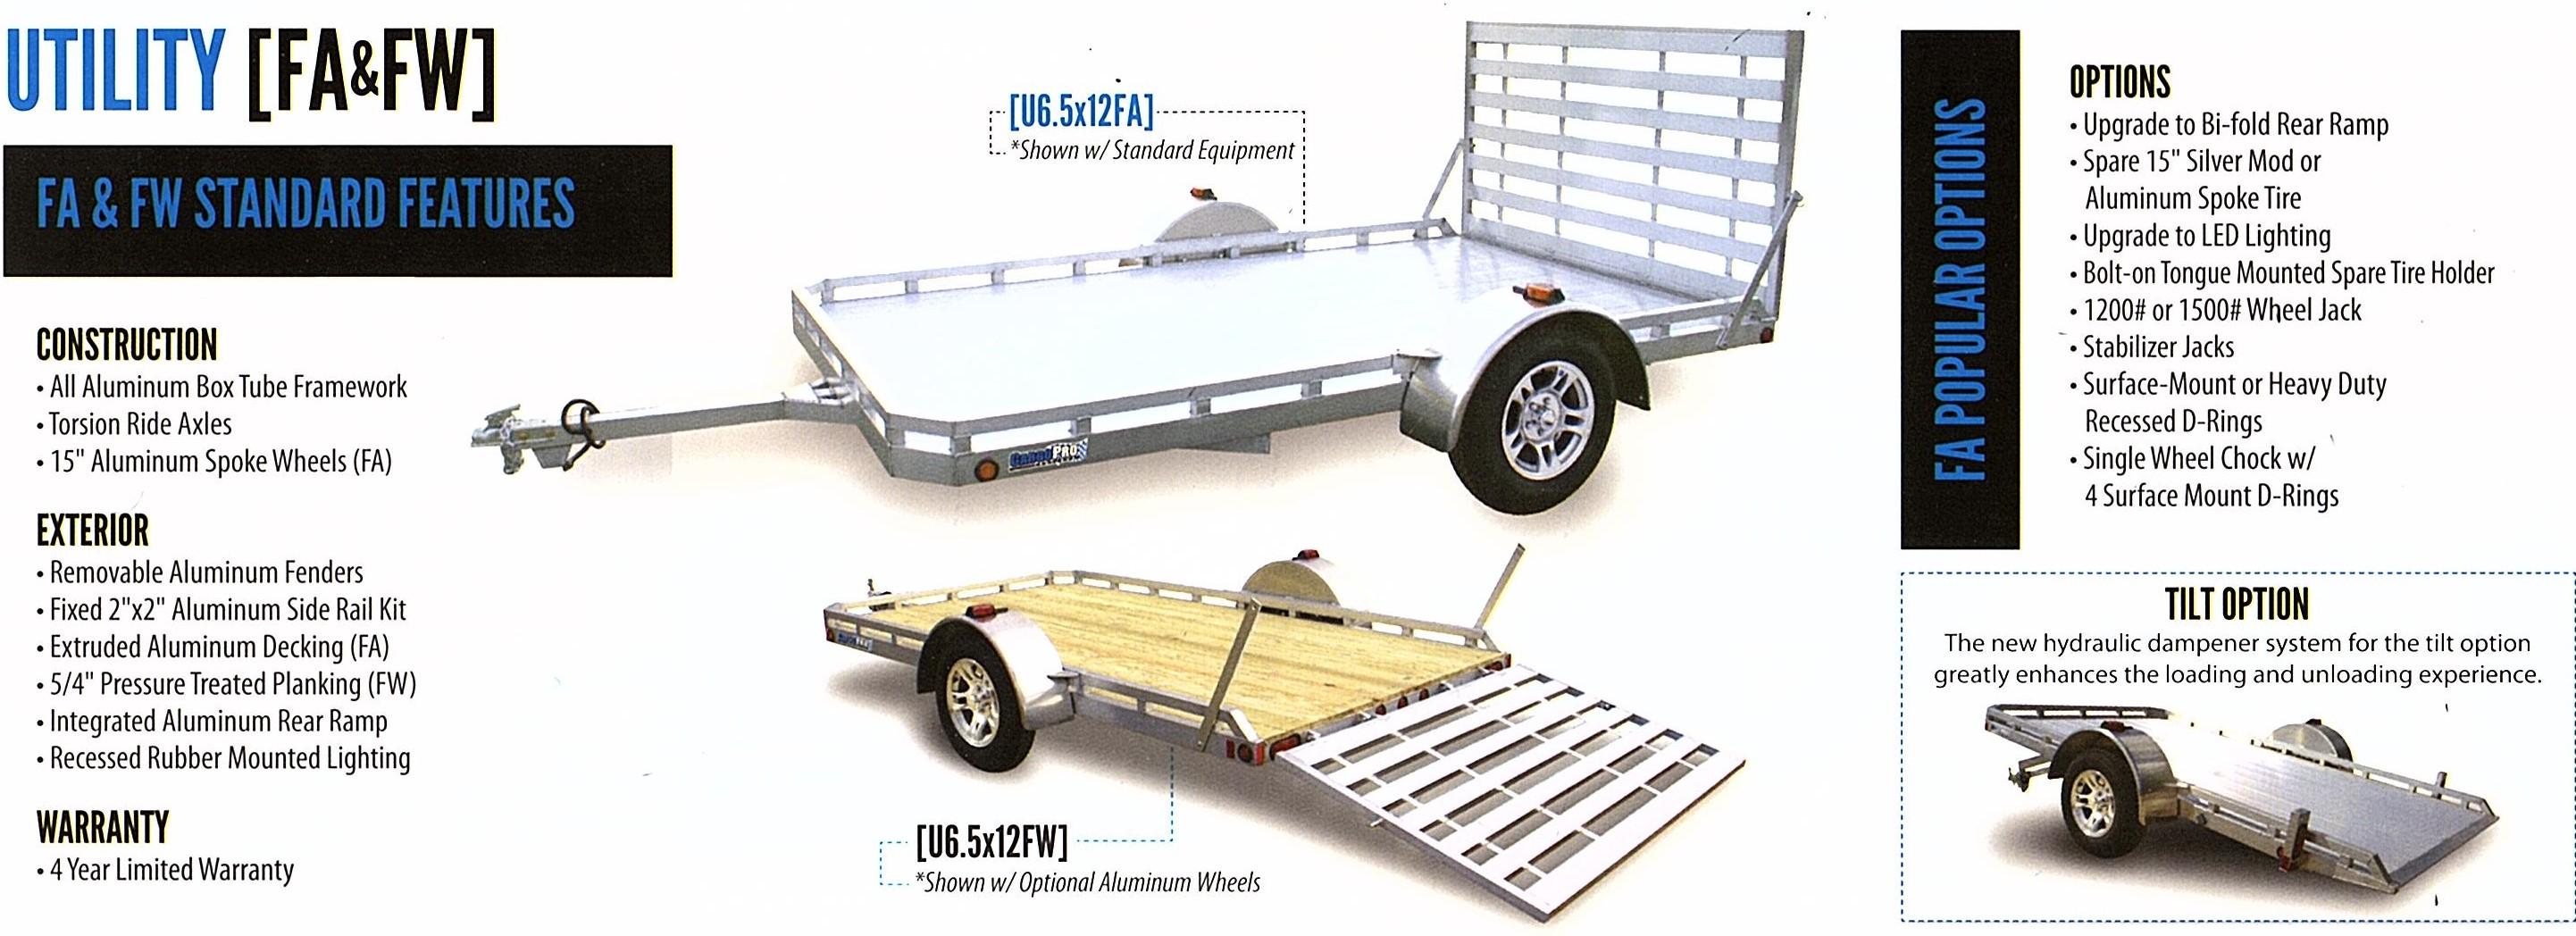 utility trailers single axle